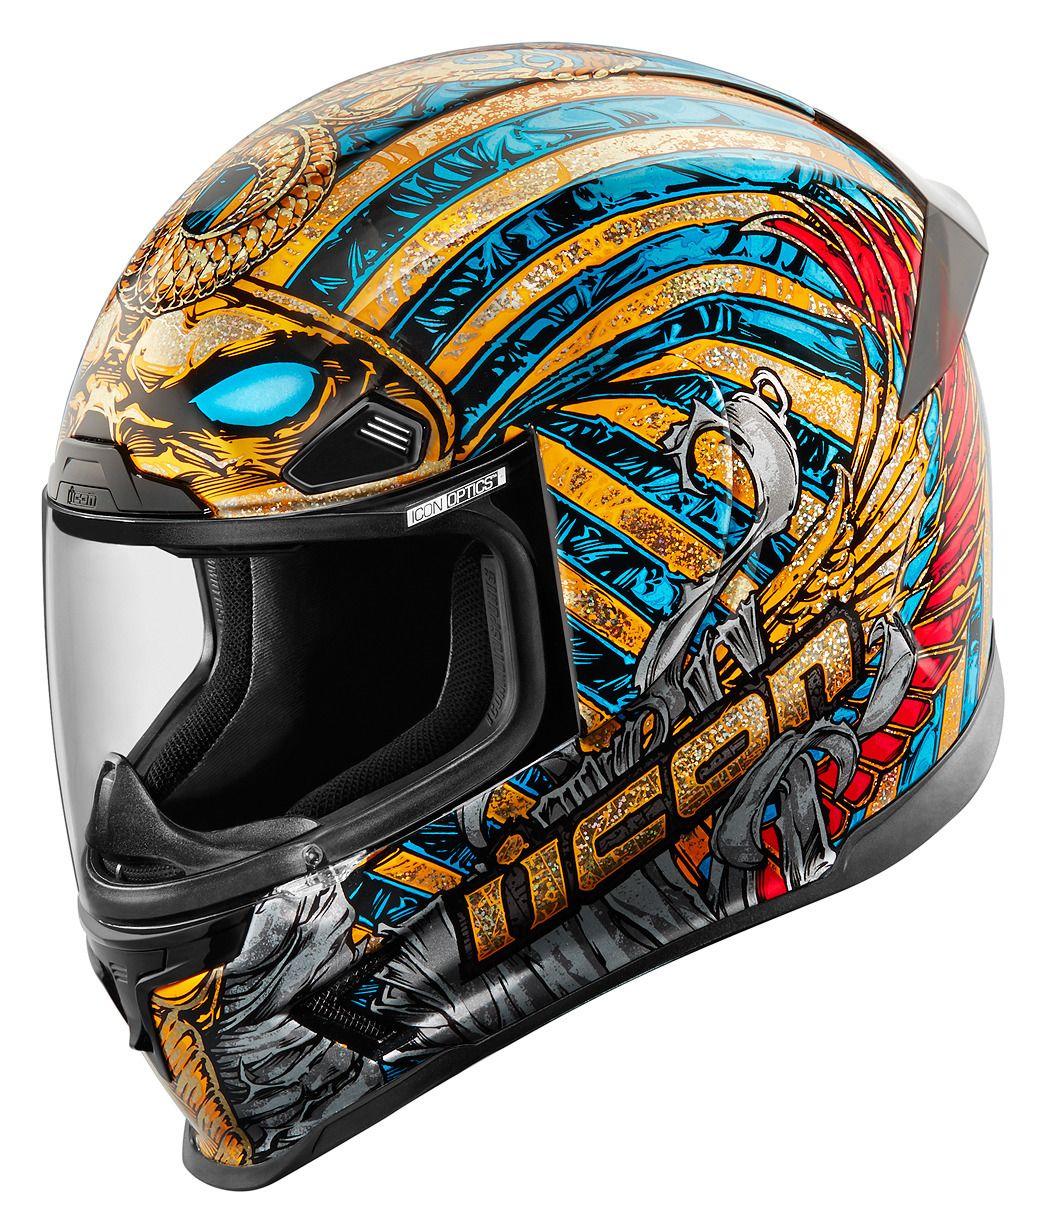 Icon Airframe Pro Pharaoh Helmet Revzilla